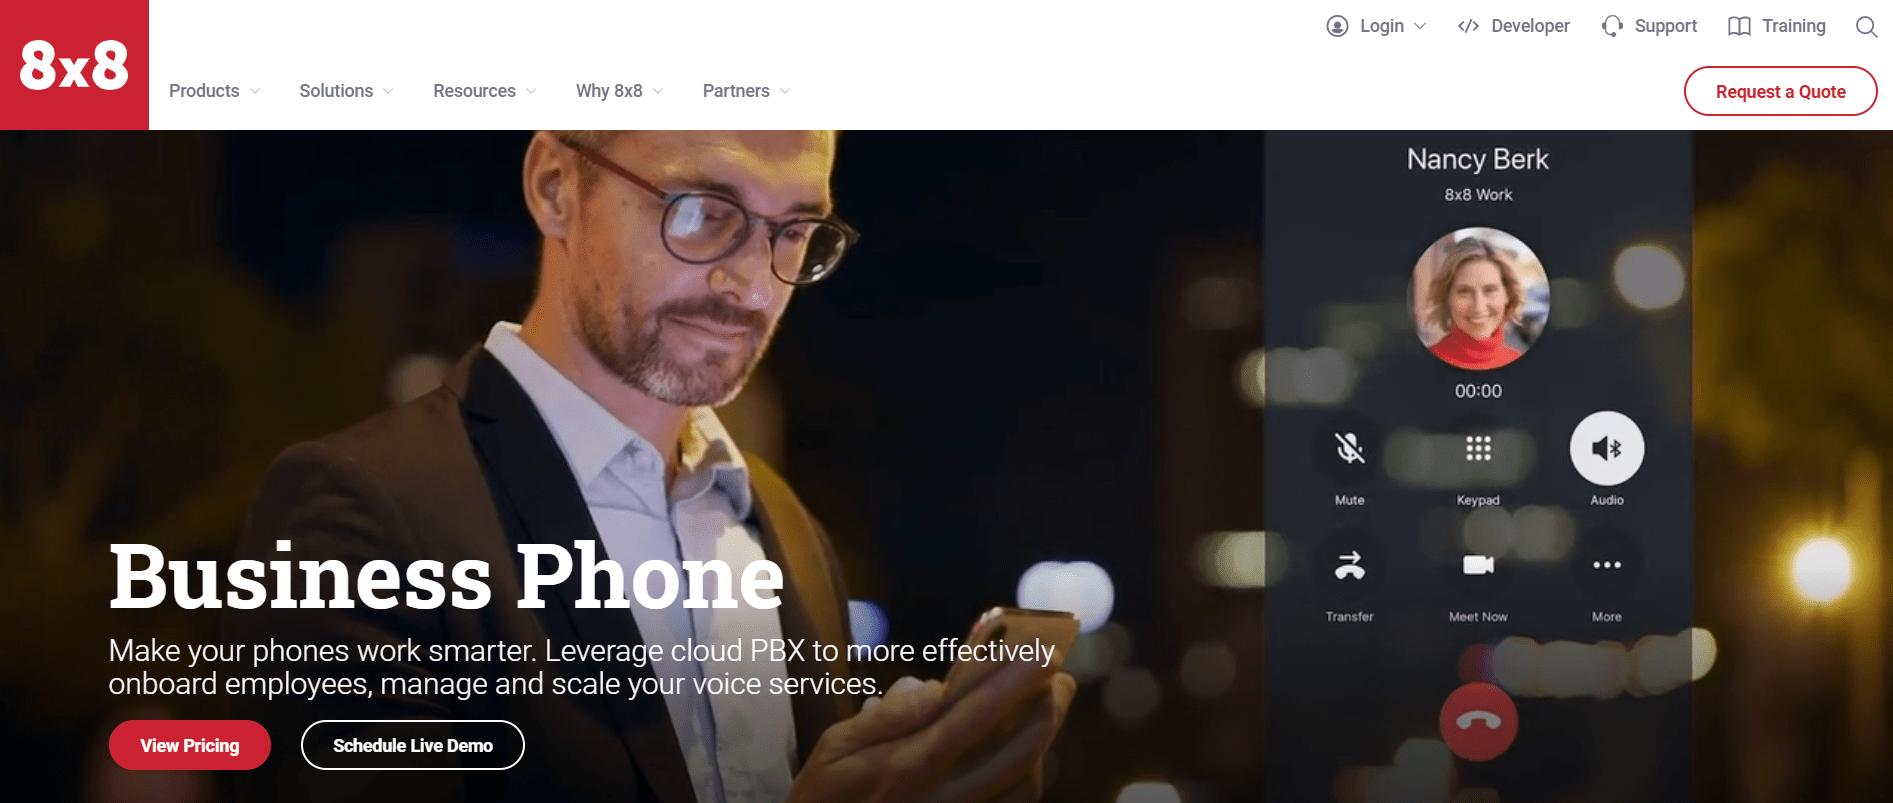 8x8 Virtual Phone Number Providers in Australia